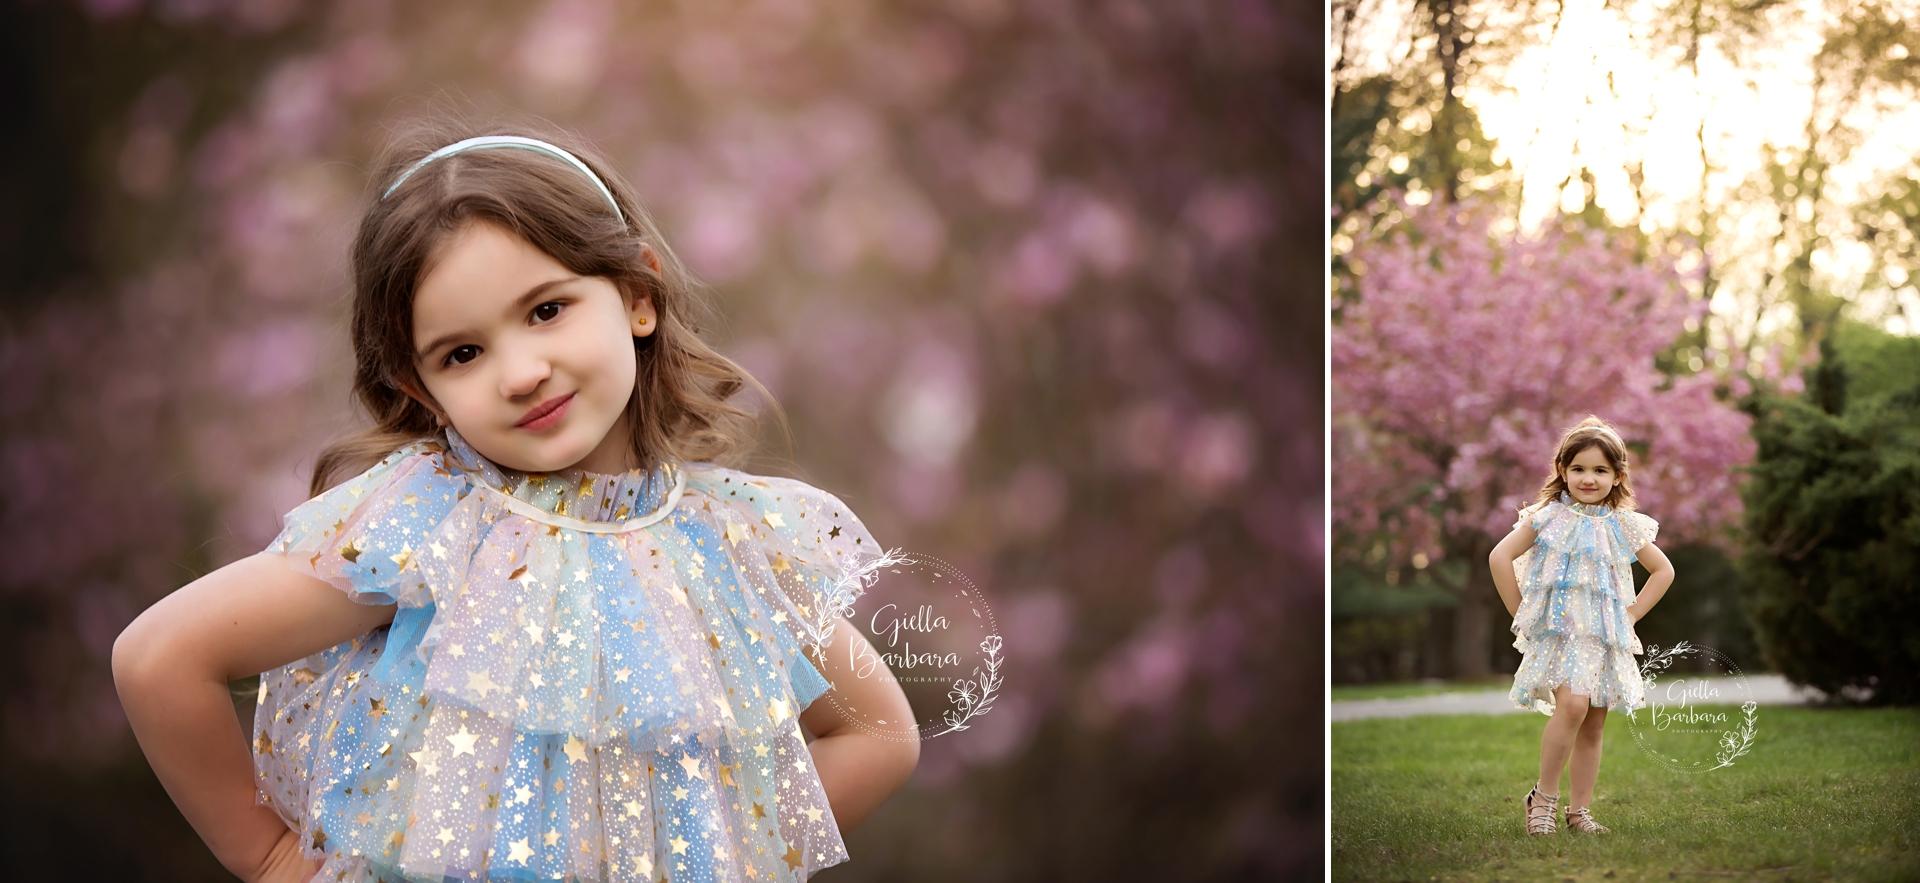 Mini Milestone Photography